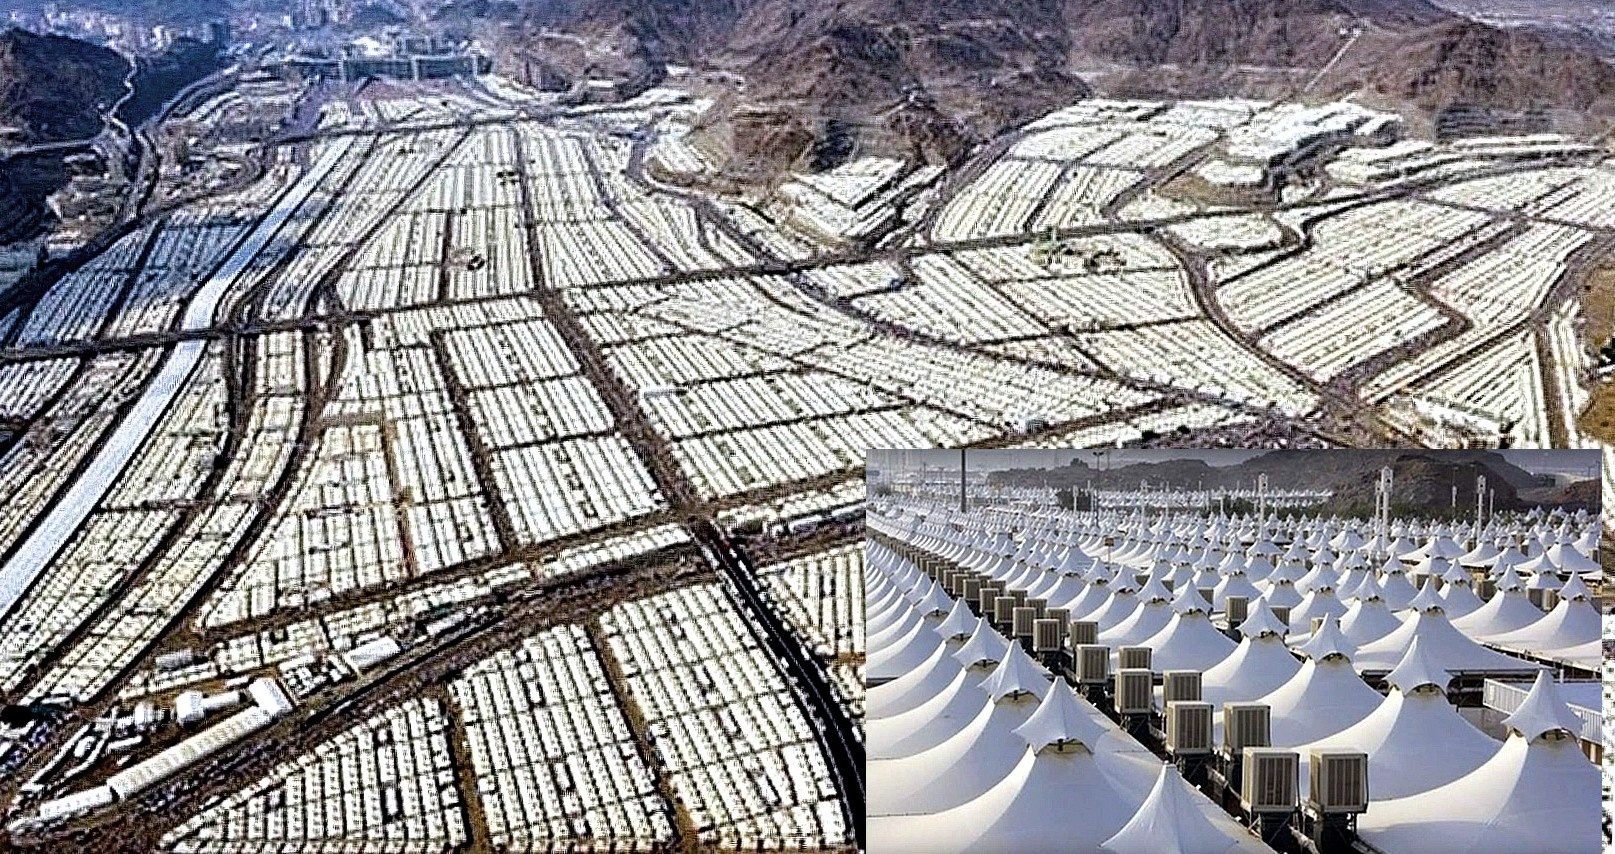 Saudi-Arabiens Zeltstadt könnte 3 Mio. Flüchtlinge aufnehmen